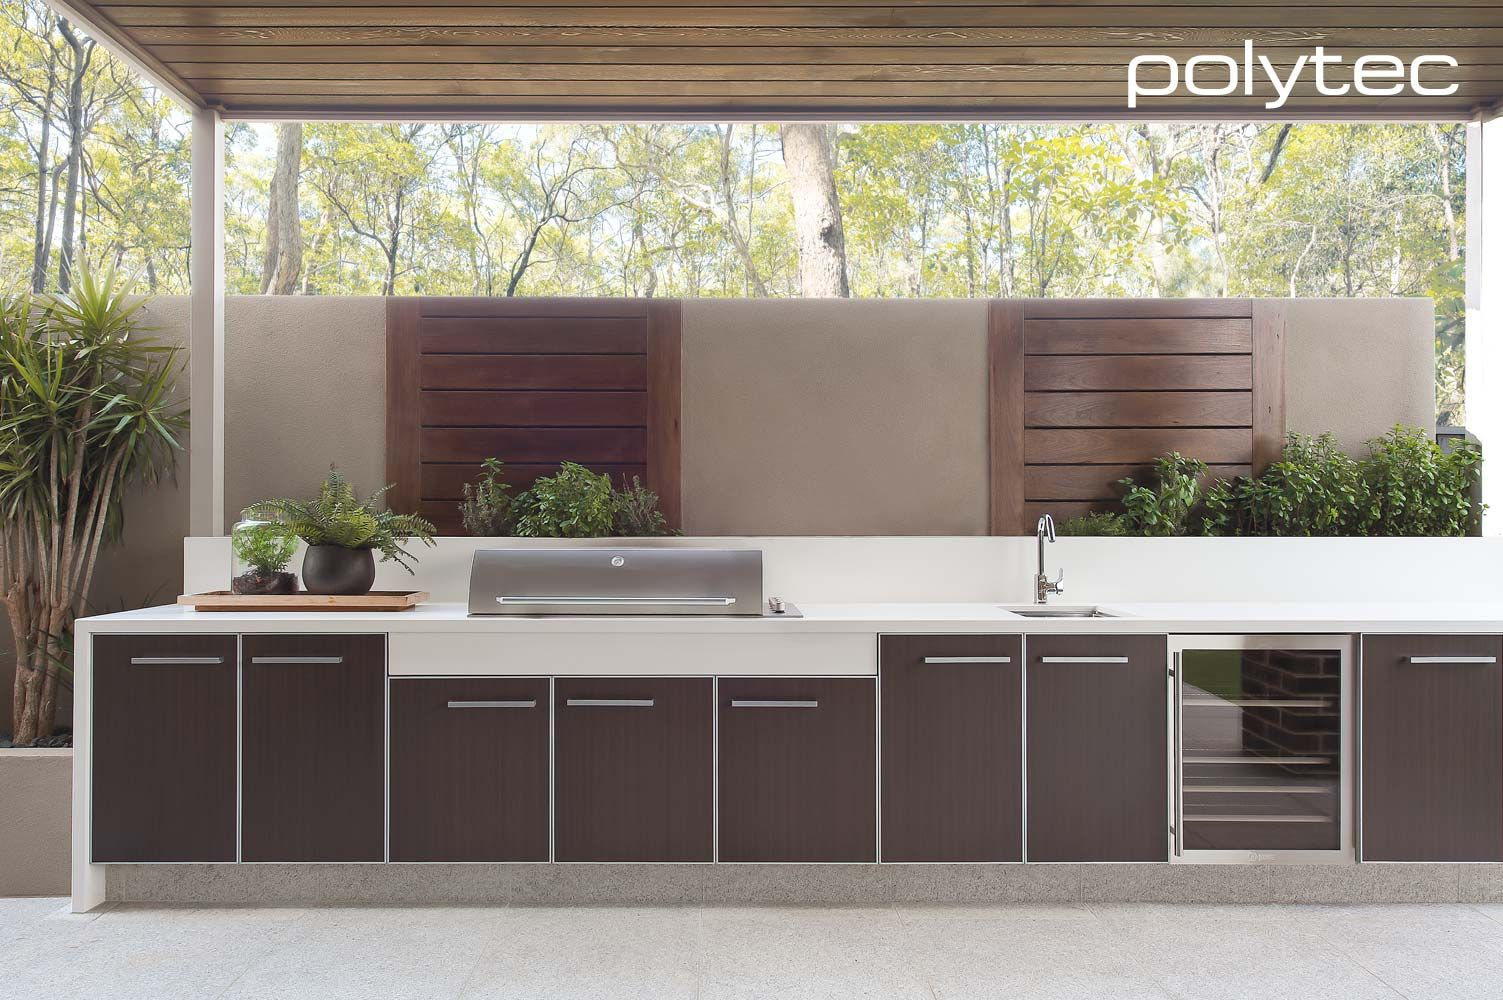 Outdoor Kitchen Cabinets Brisbane Polytec Doors In Aluminium 5mm 55mm Satin Alumunium Frame With